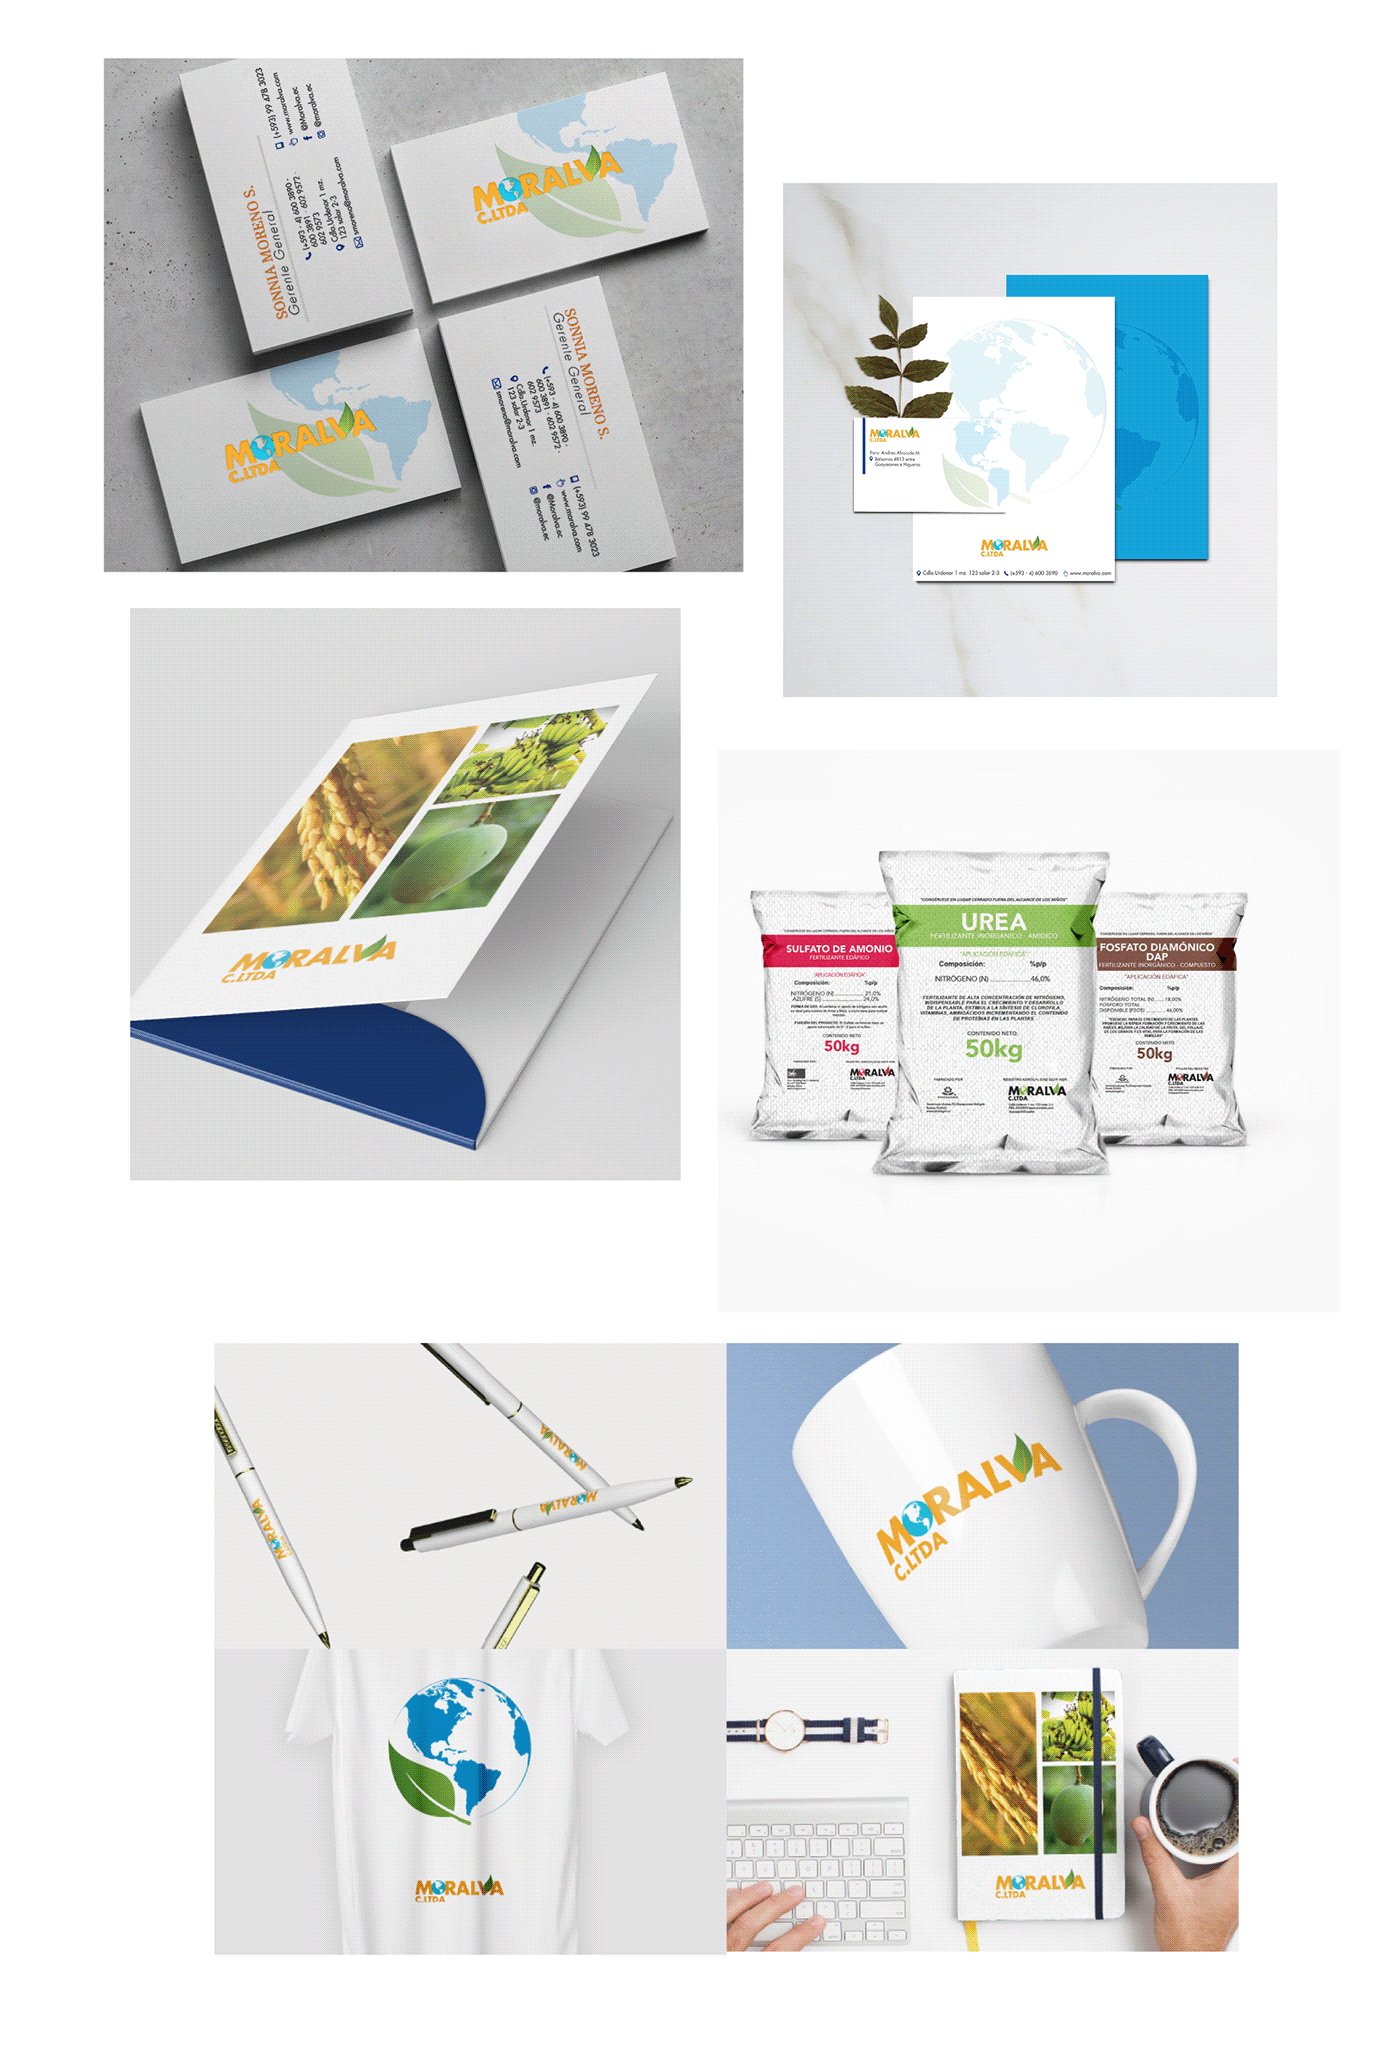 diseño gráfico adobe illustrator Adobe Photoshop devops graphic design  branding  websites Responsive marca